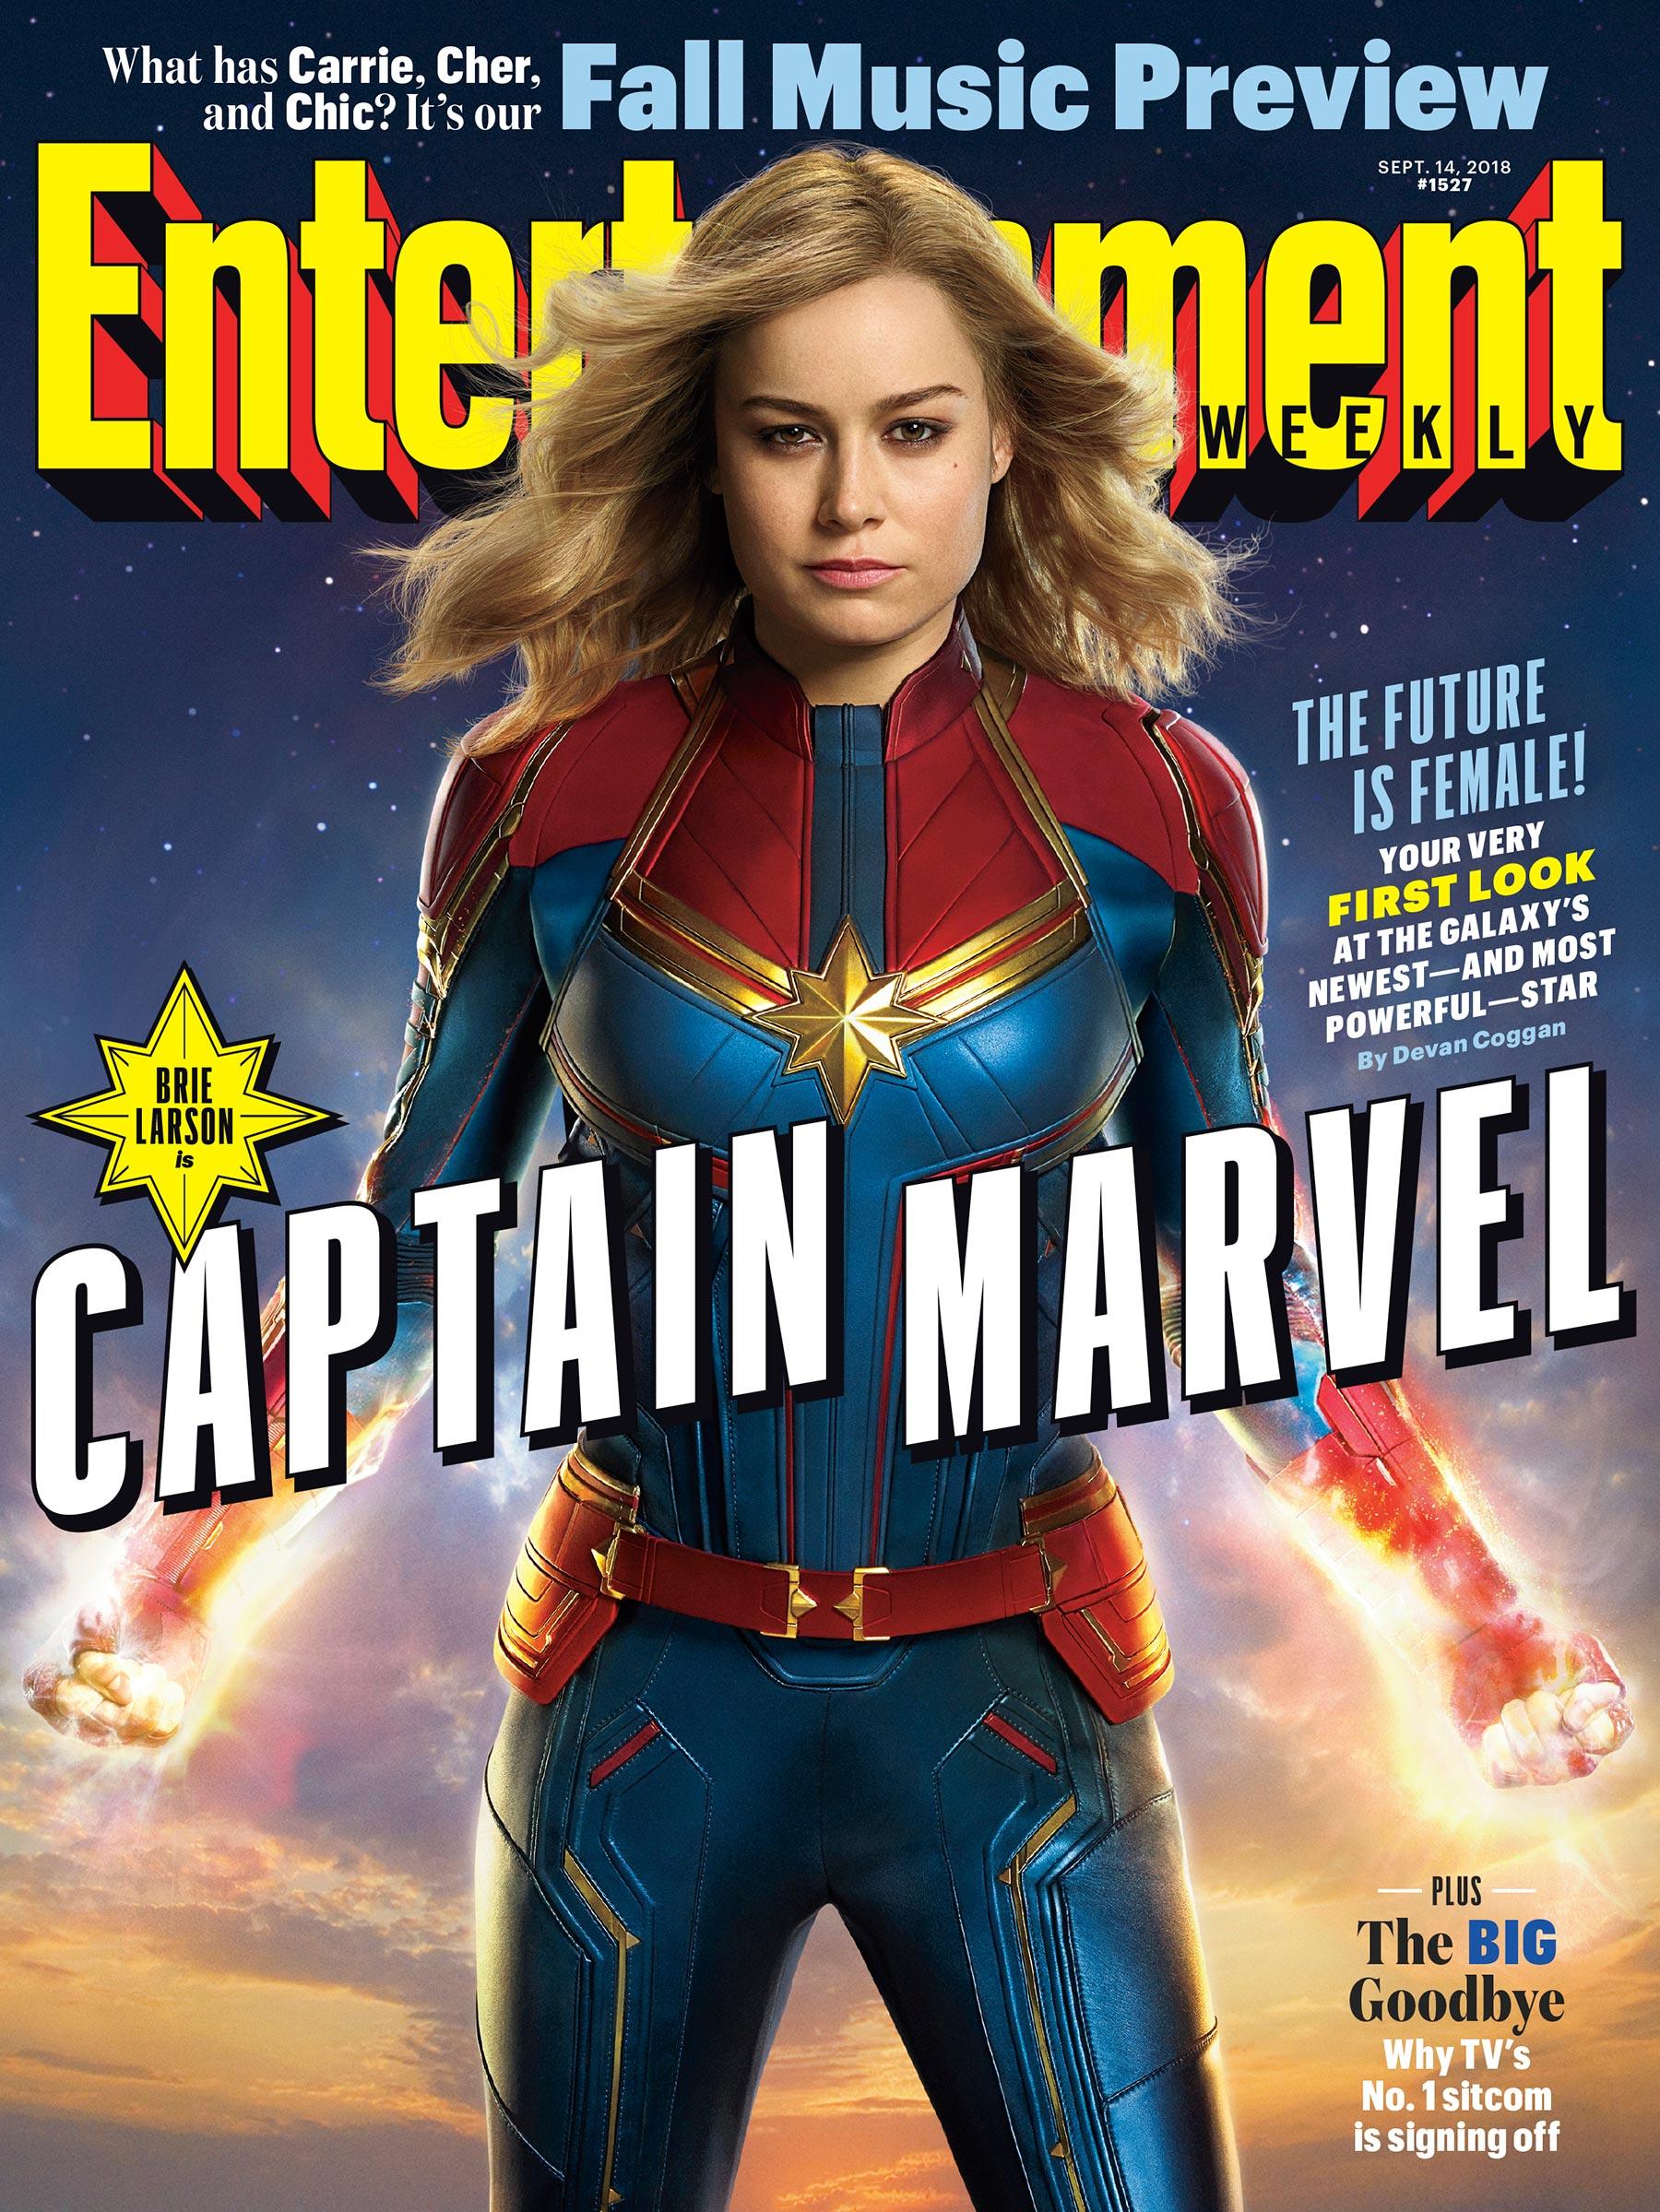 Captain Marvel Ew-15210